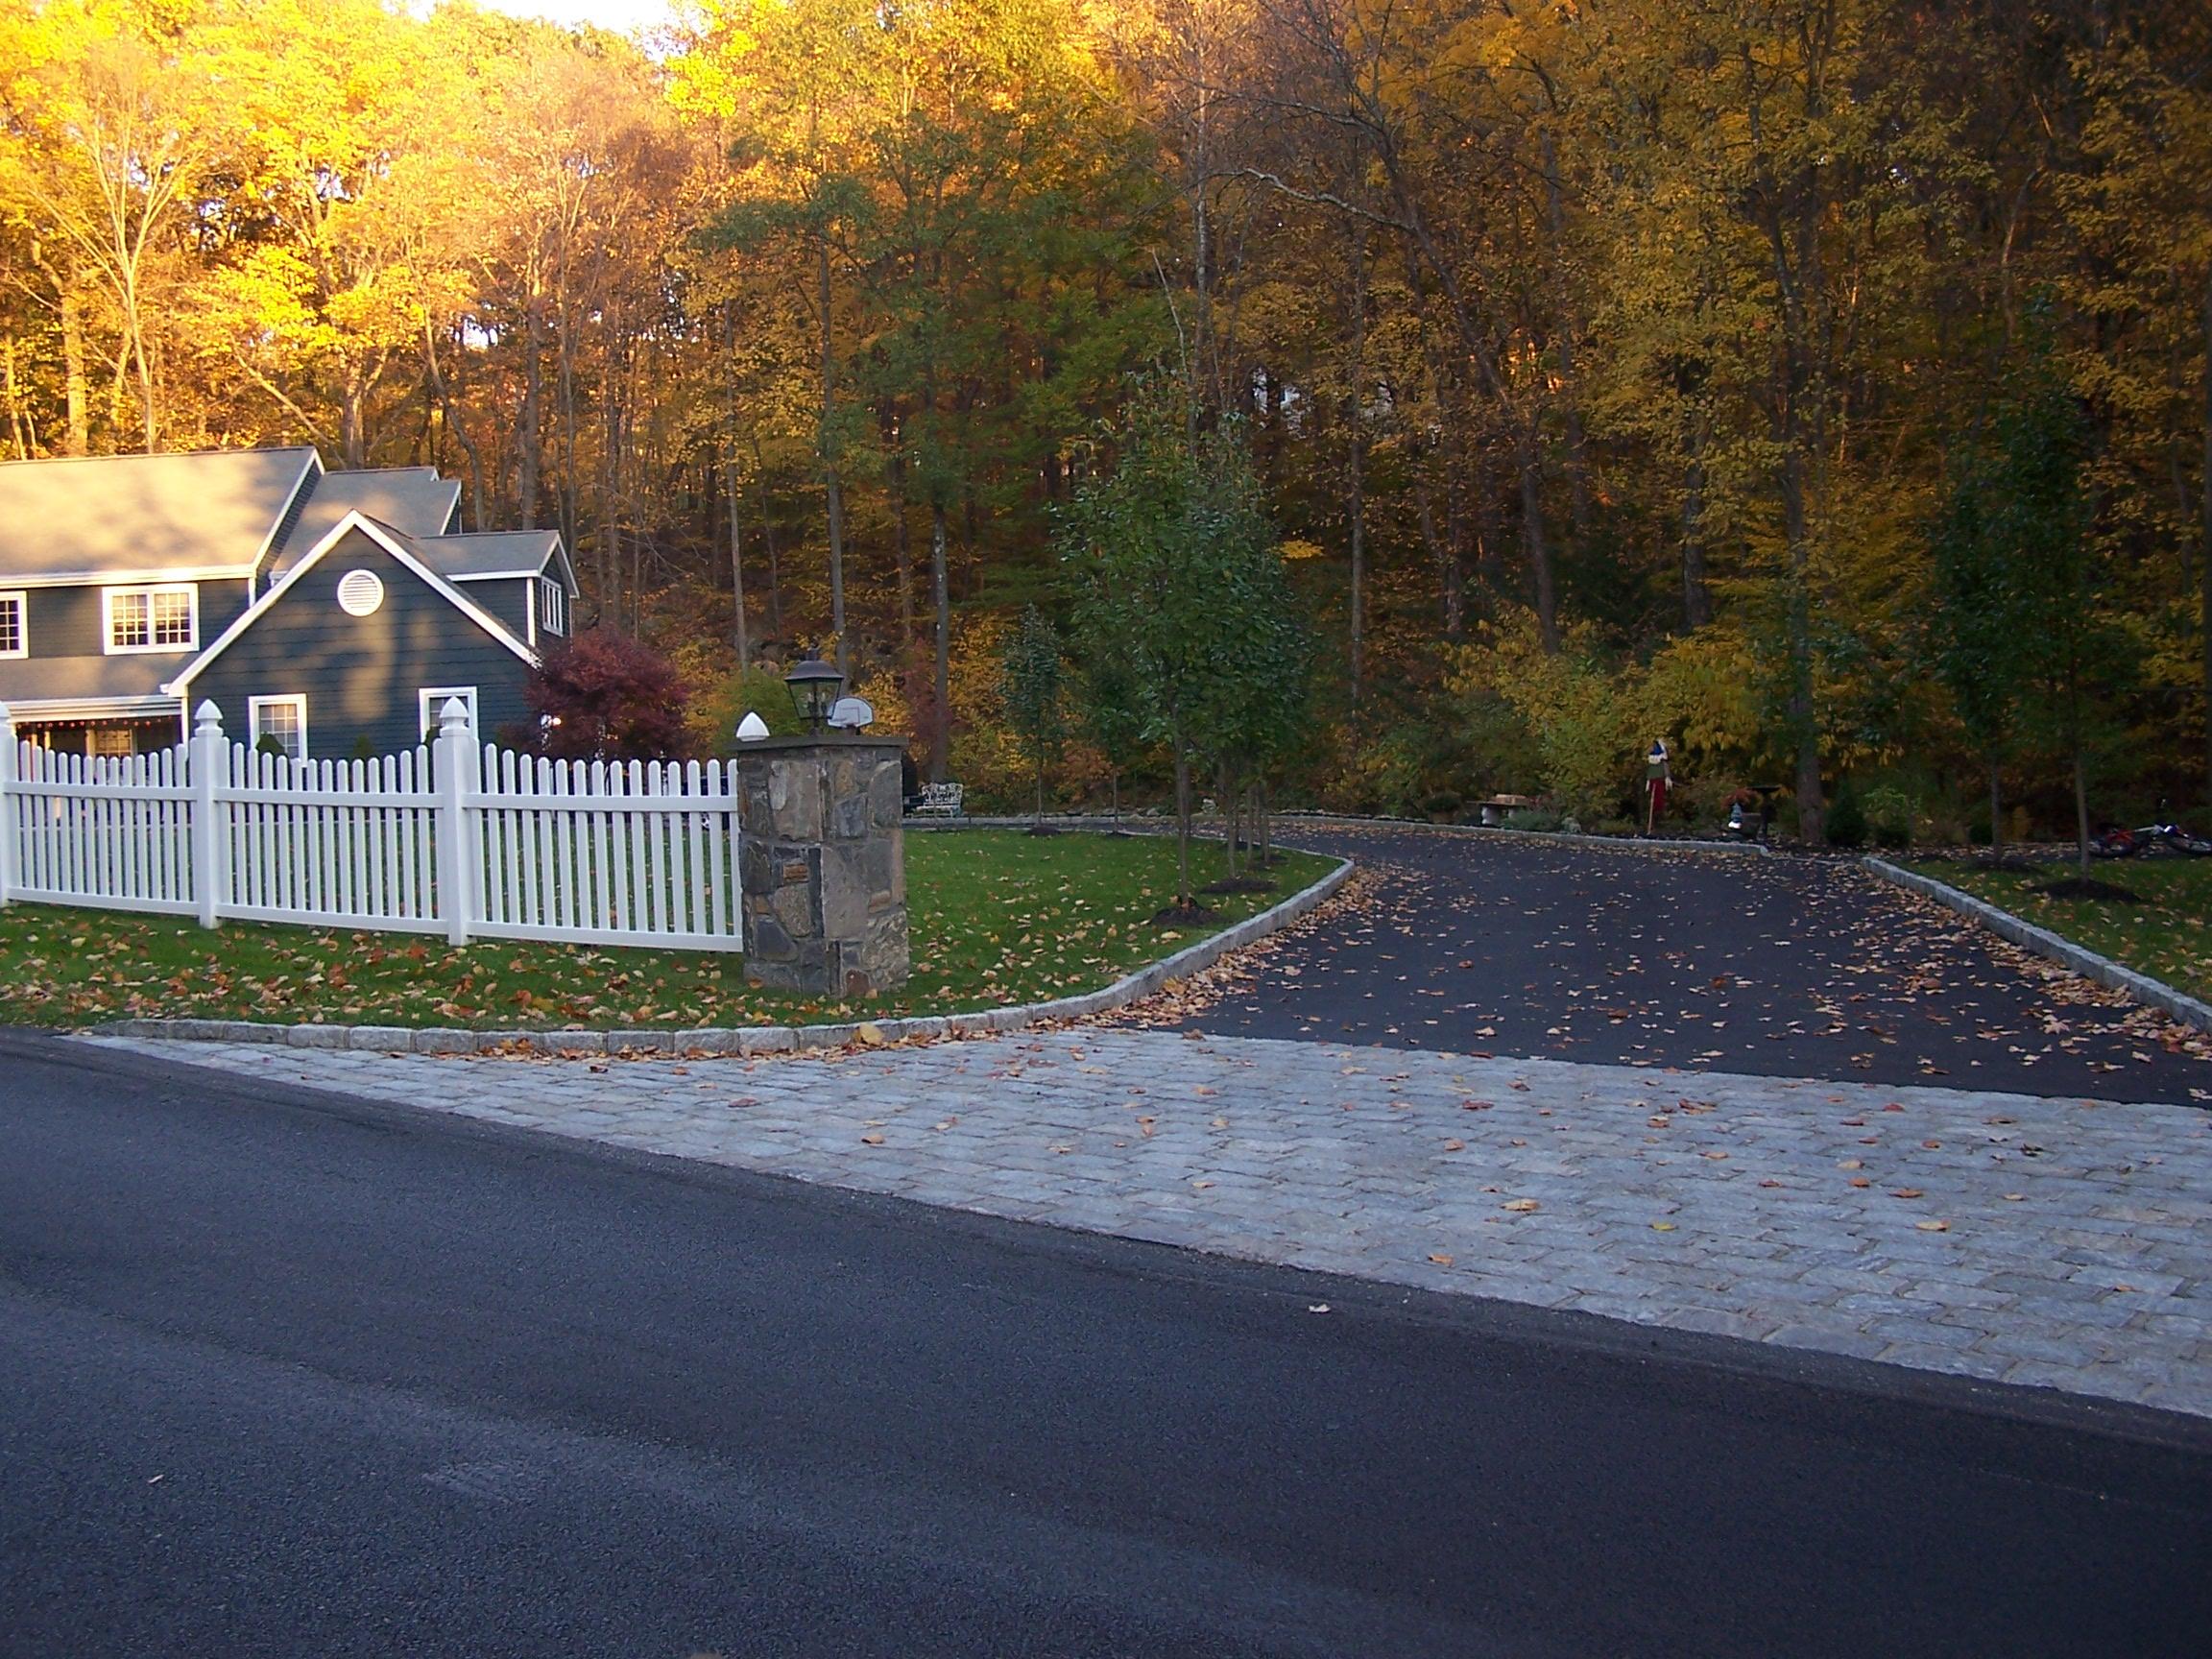 Driveway in Yorktown, Peekskill, New York